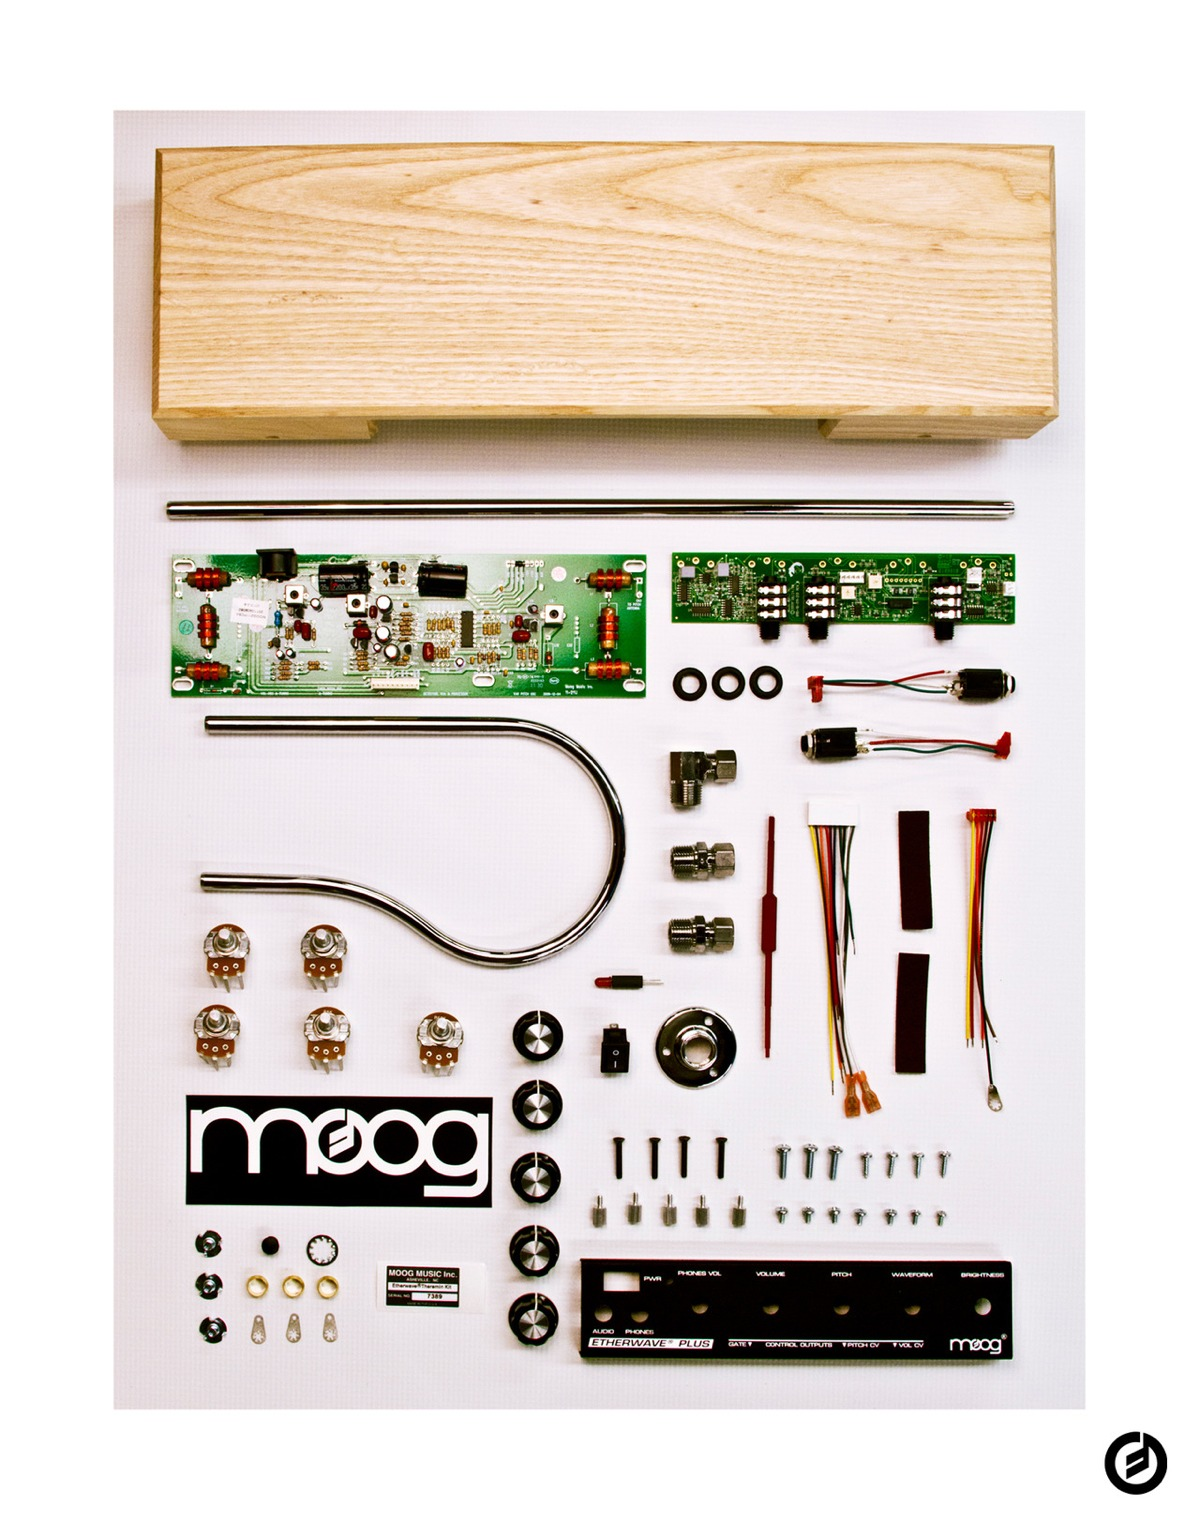 moog etherwave standard theremin kit adafruit industries makers hackers artists designers. Black Bedroom Furniture Sets. Home Design Ideas